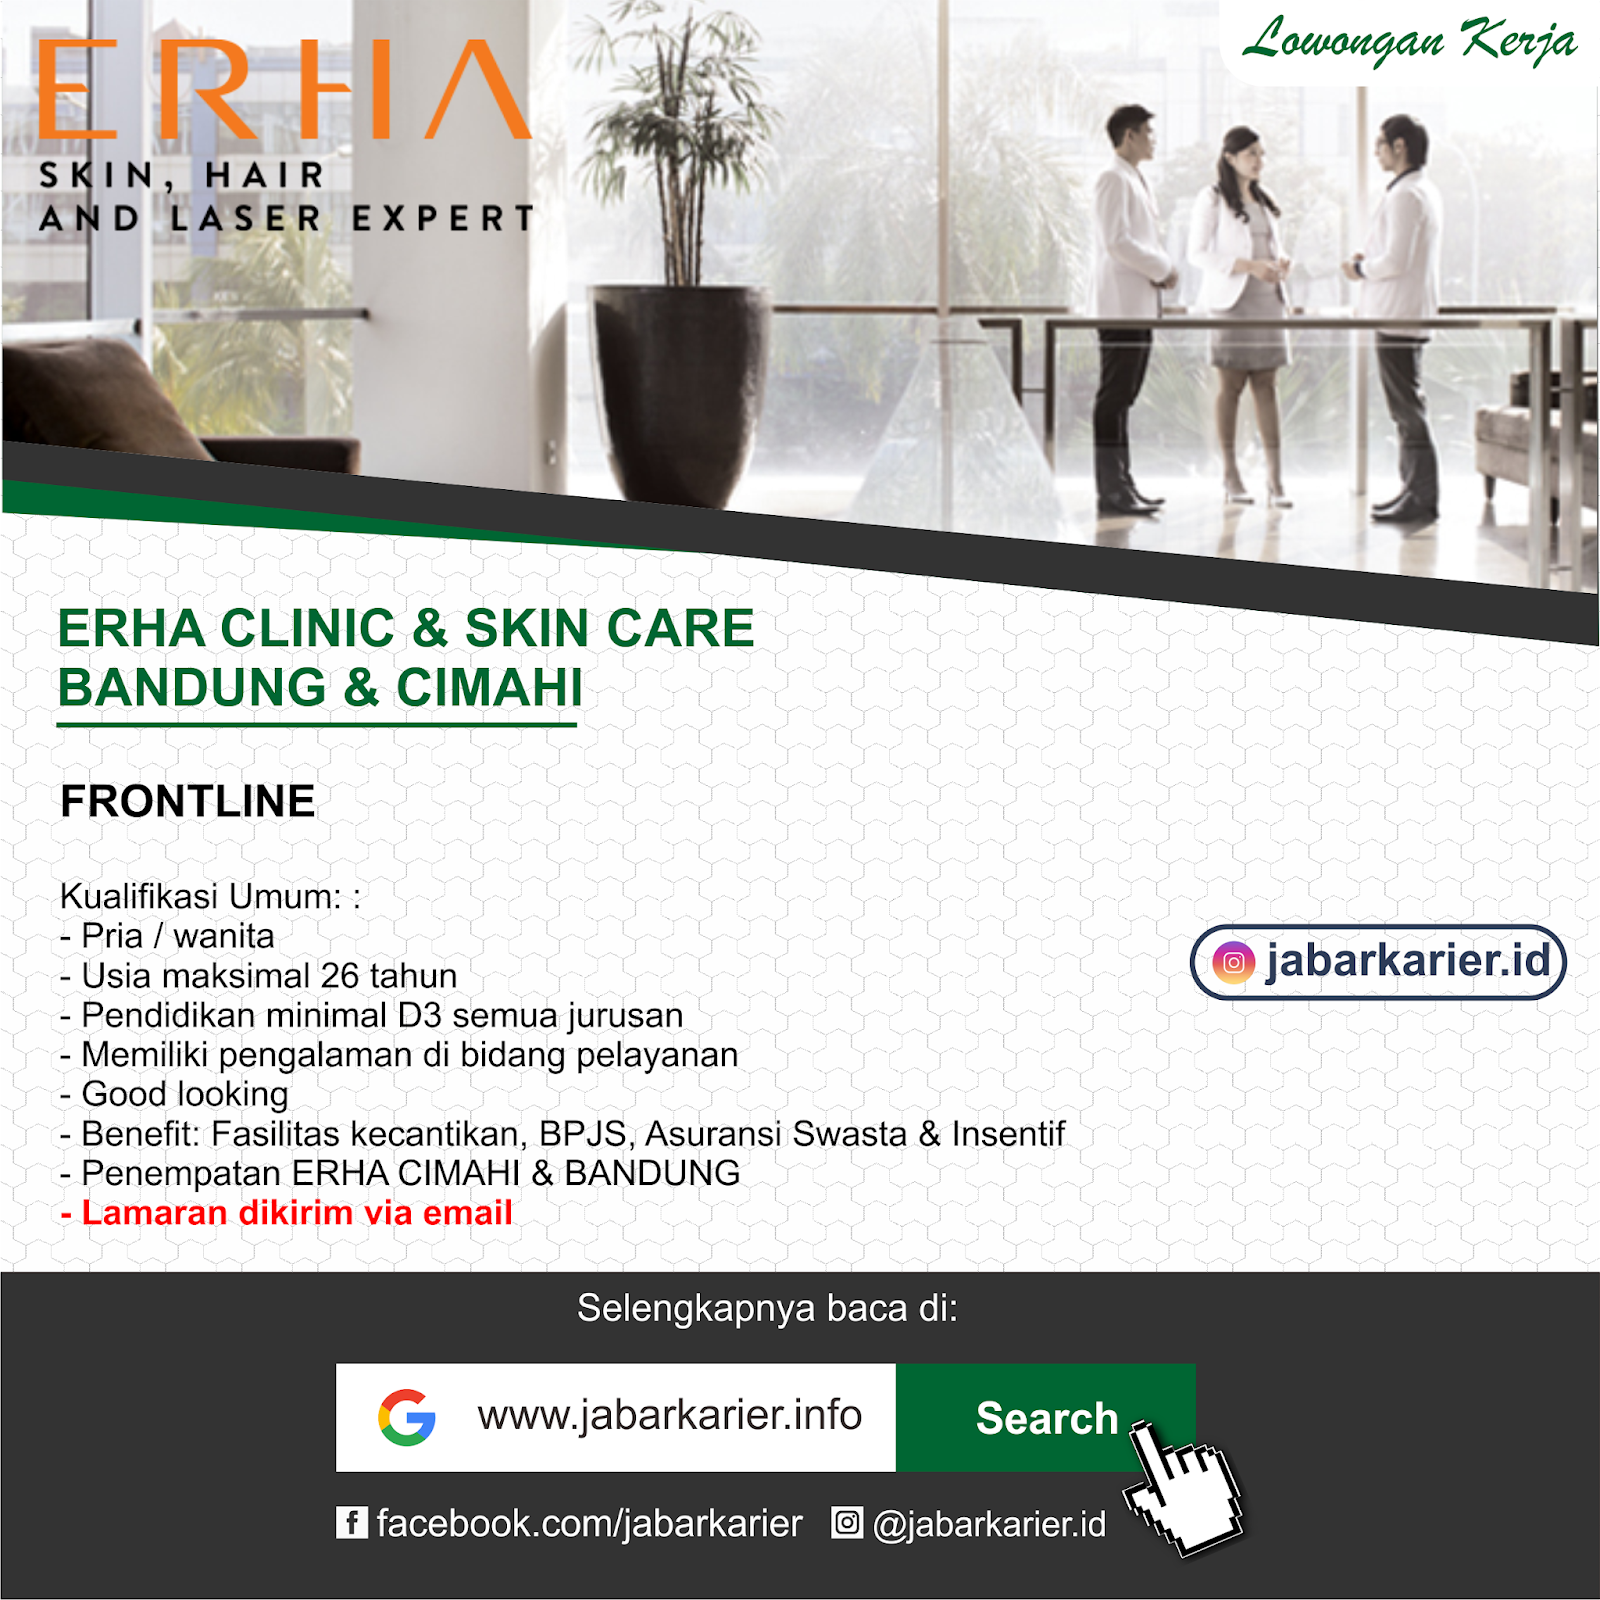 Lowongan Kerja ERHA Clinic Bandung & Cimahi Agustus 2019 ...